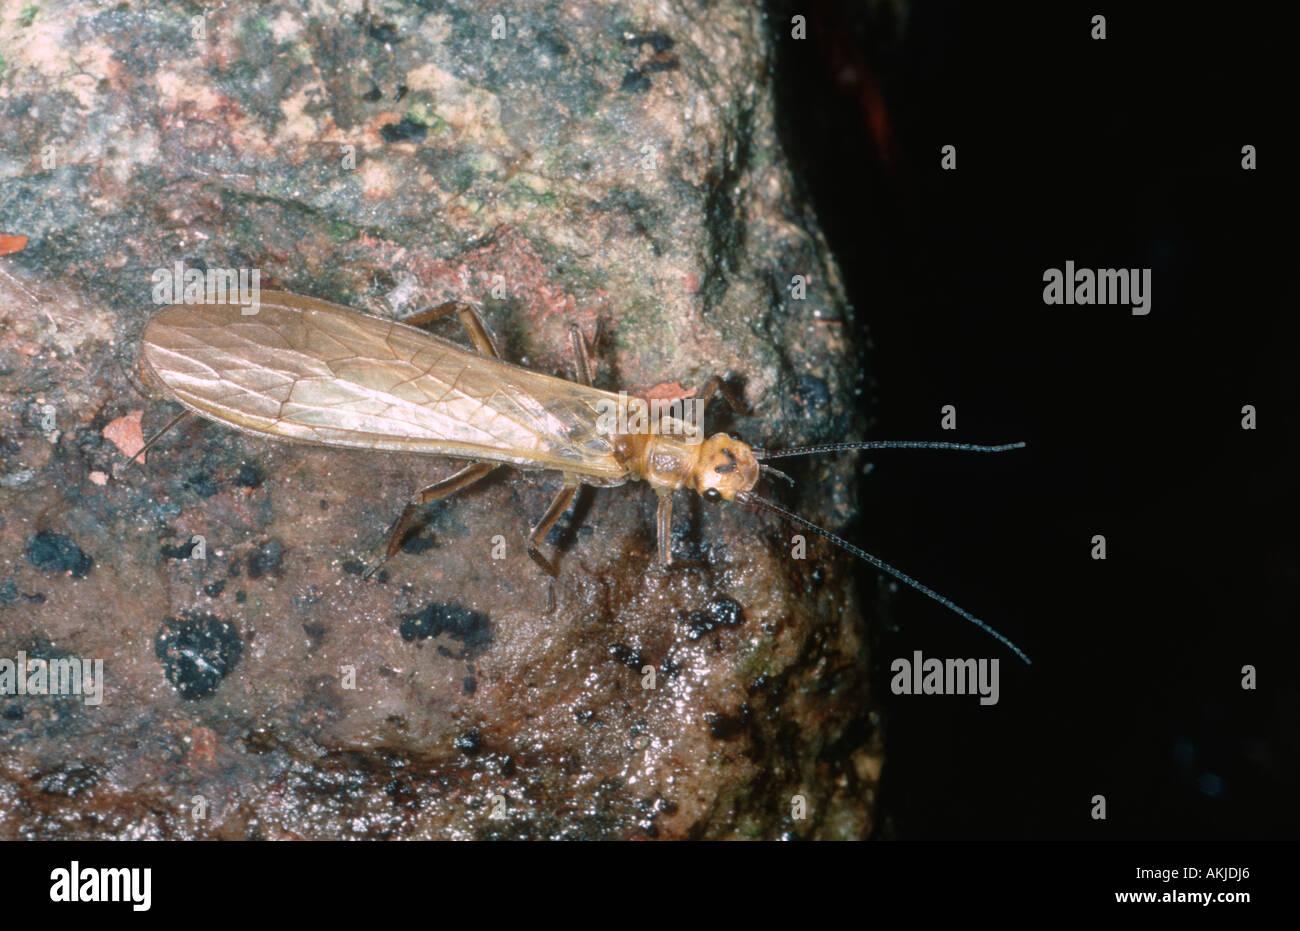 Stonefly, Perla sp. - Stock Image